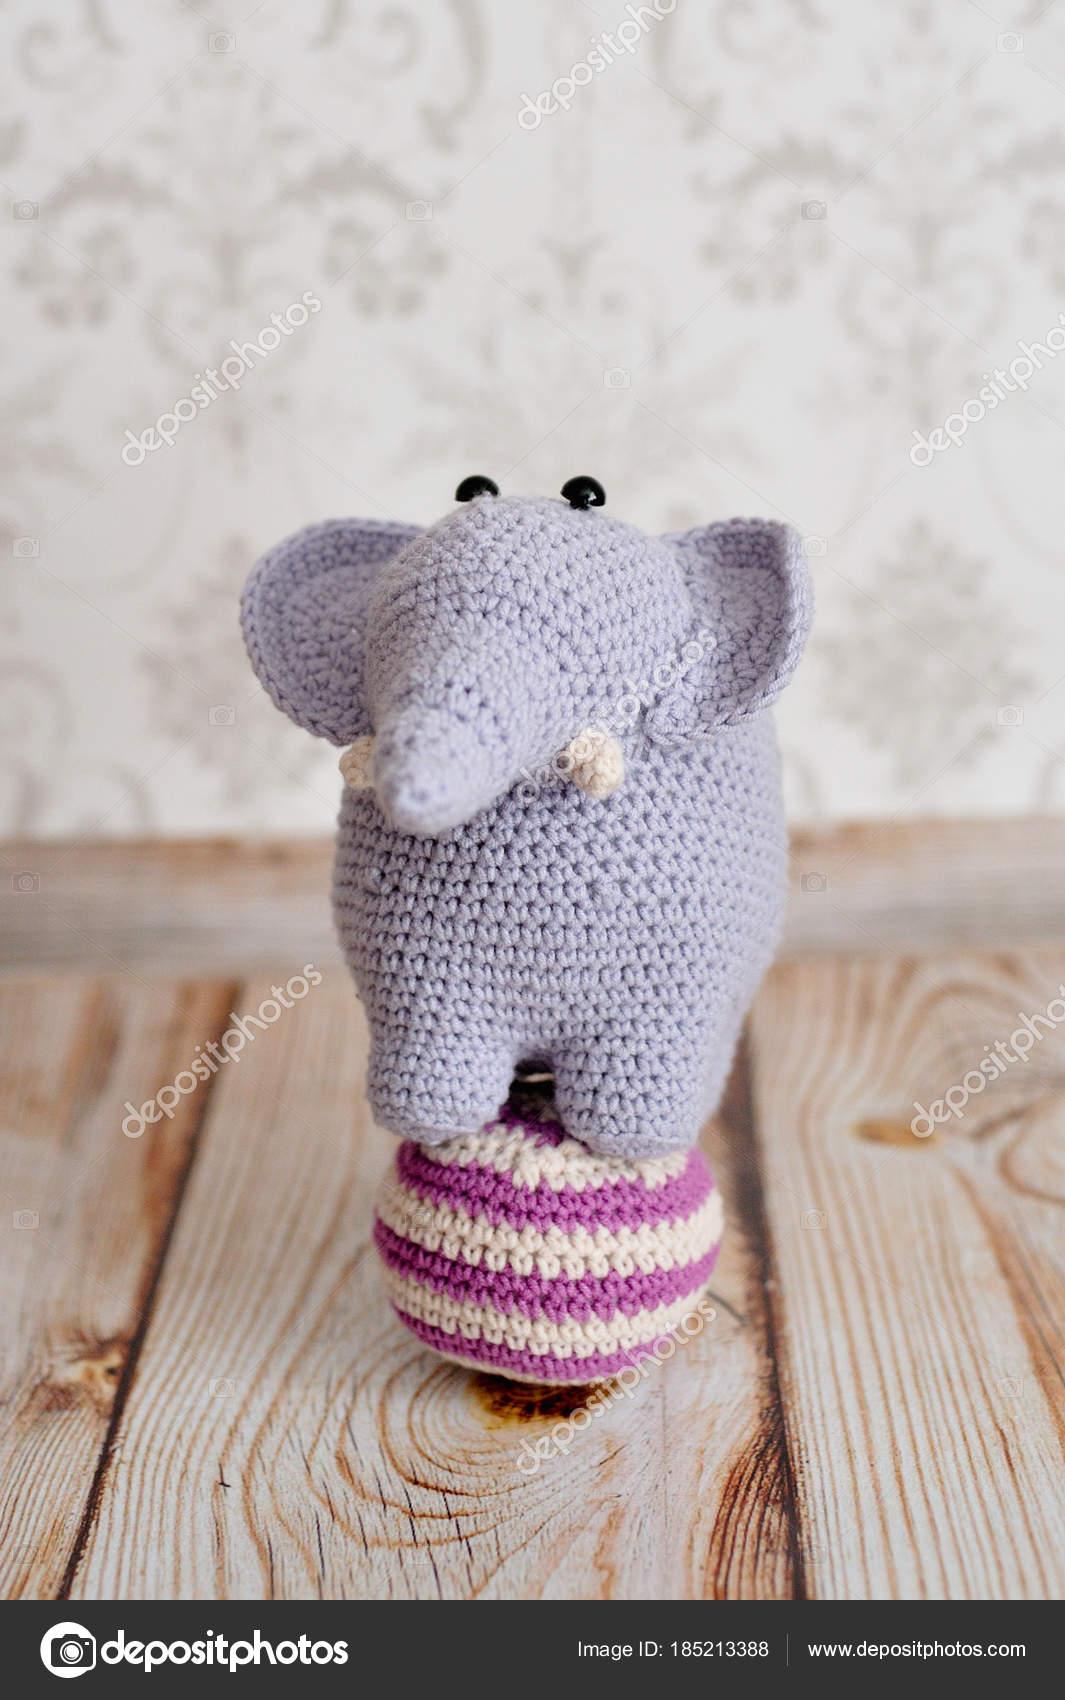 Esther the Elephant   Recipe   Crochet elephant pattern, Crochet ...   1700x1065